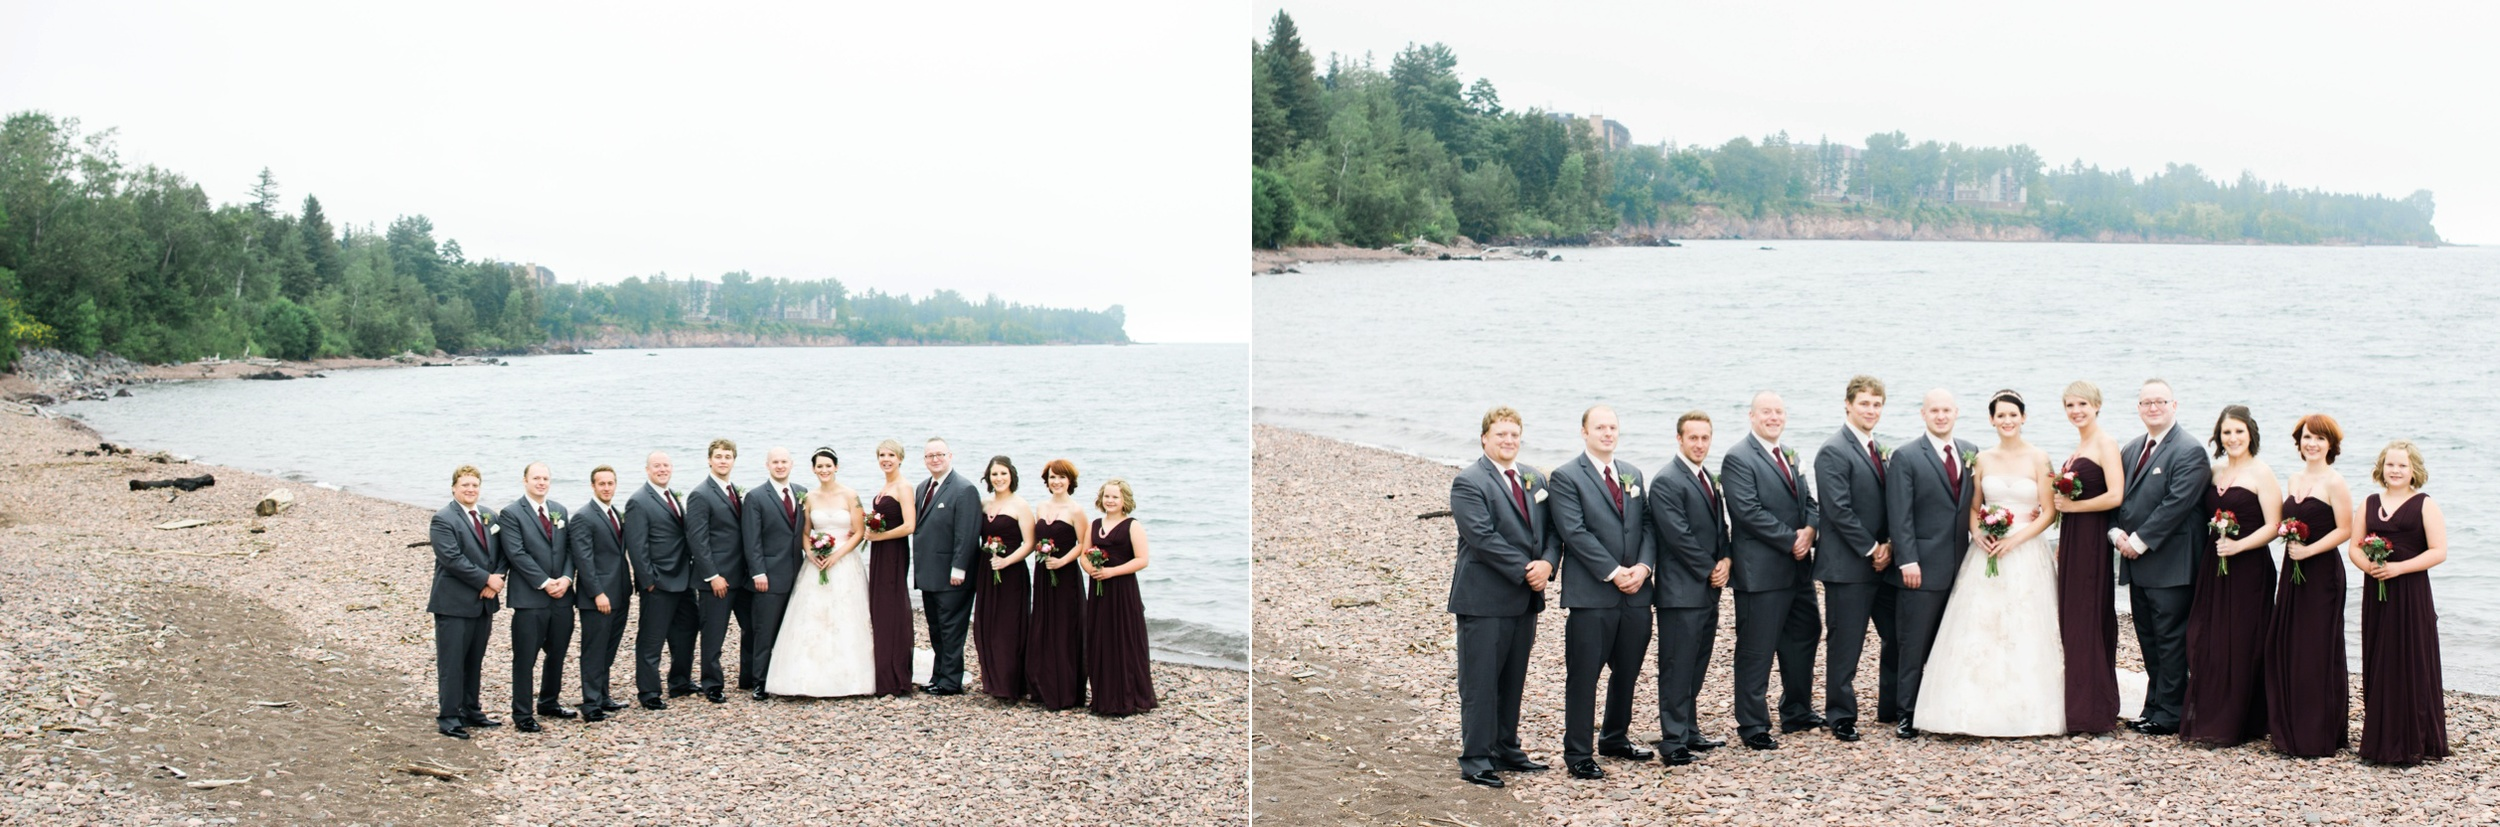 Glensheen Mansion Wedding | Duluth, MN Wedding Photographer_0489.jpg